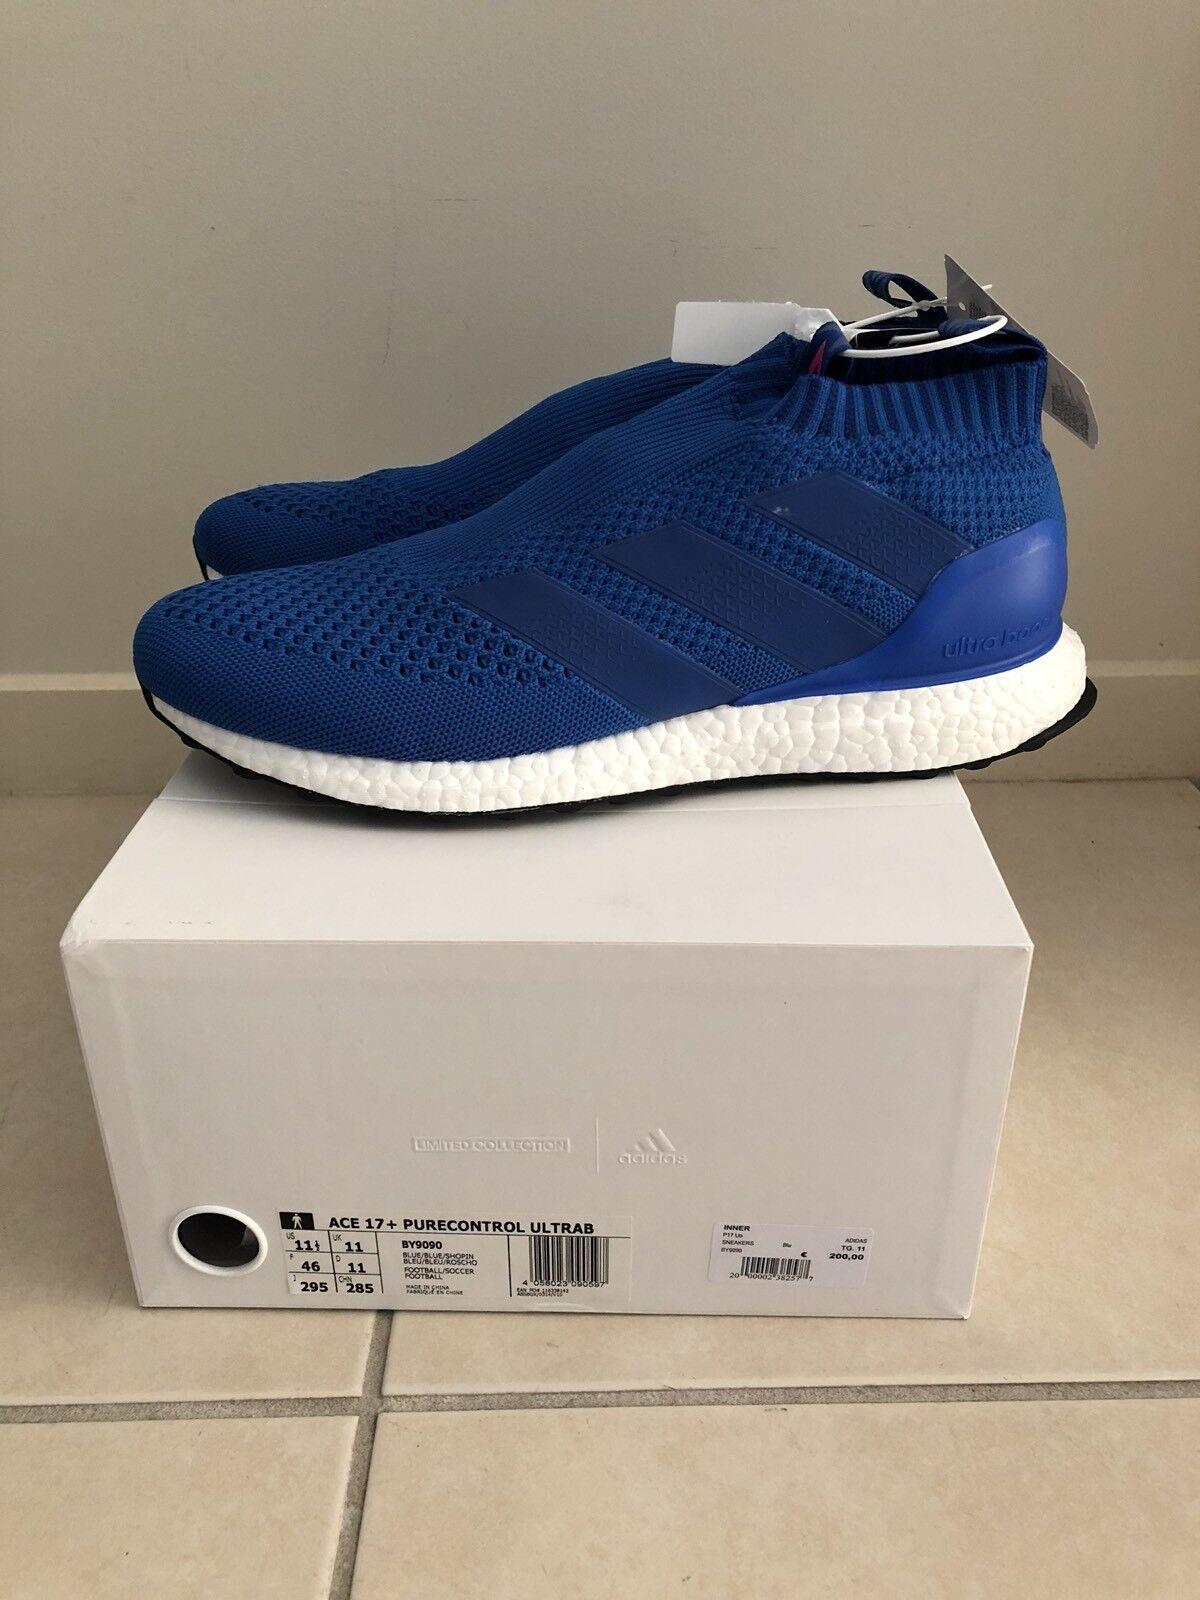 Adidas Ace 16 + 17+ Purecontrol US11.5 UK11 EU46 Ultra boost bluee pure control